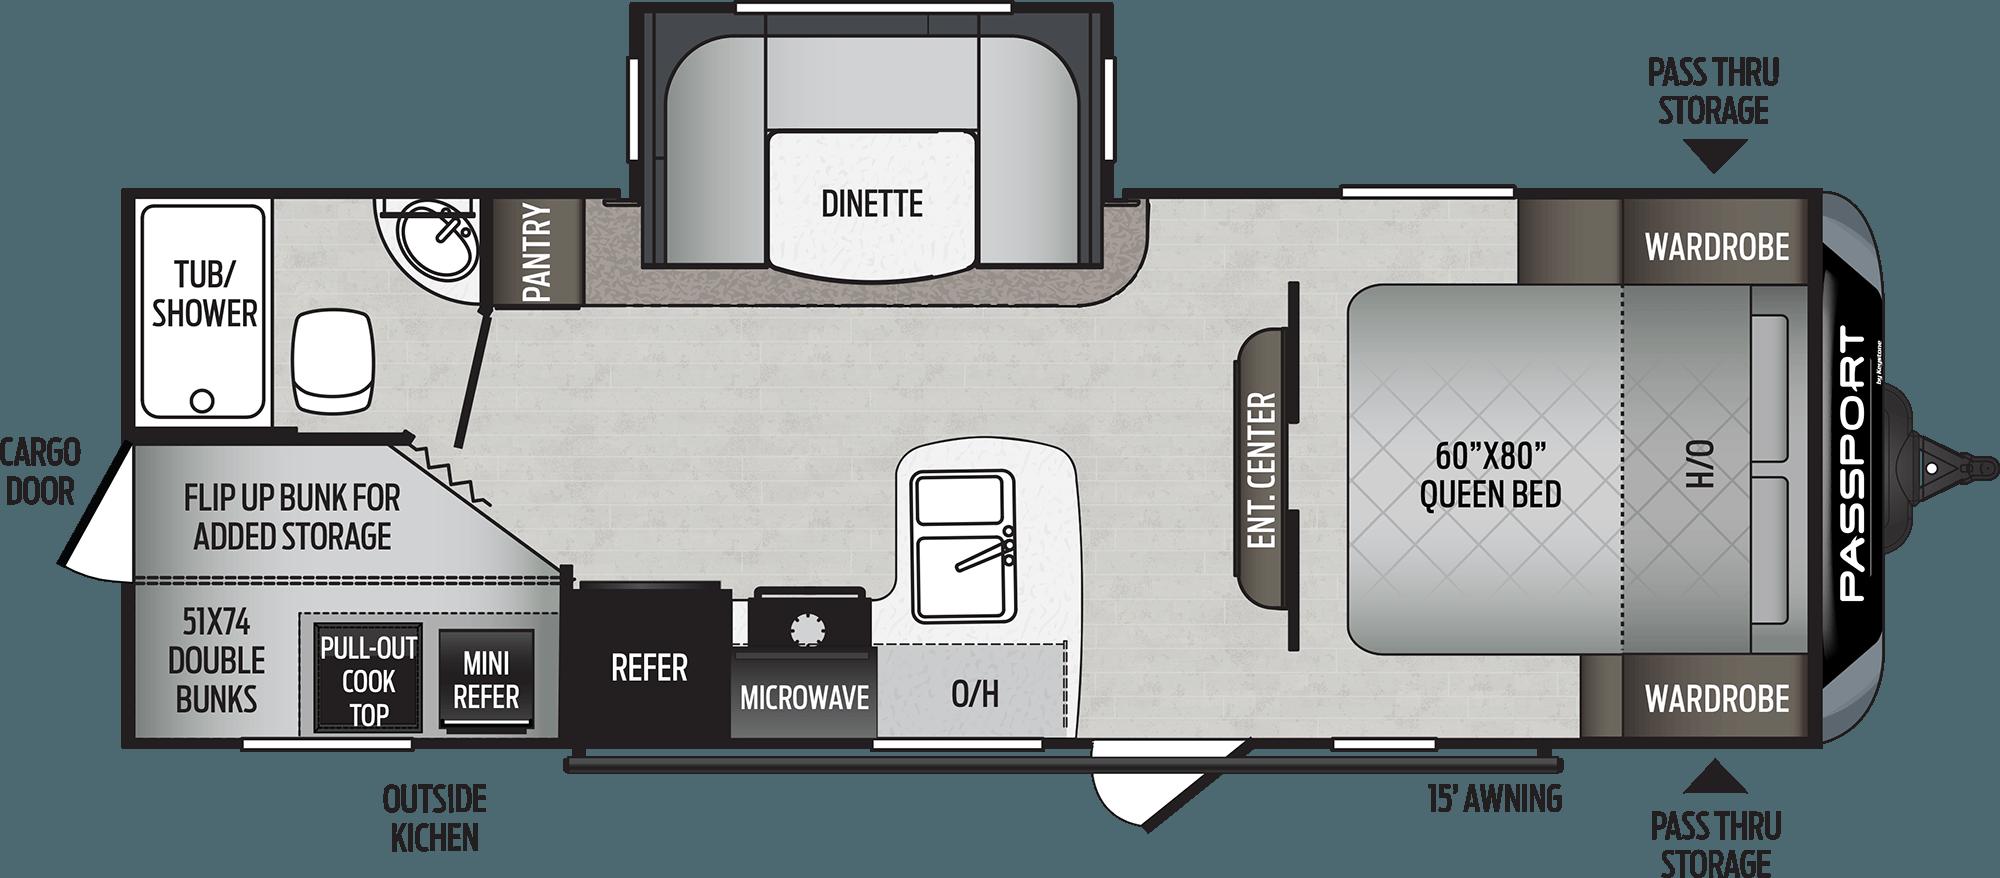 2020 KEYSTONE PASSPORT SL 240BH